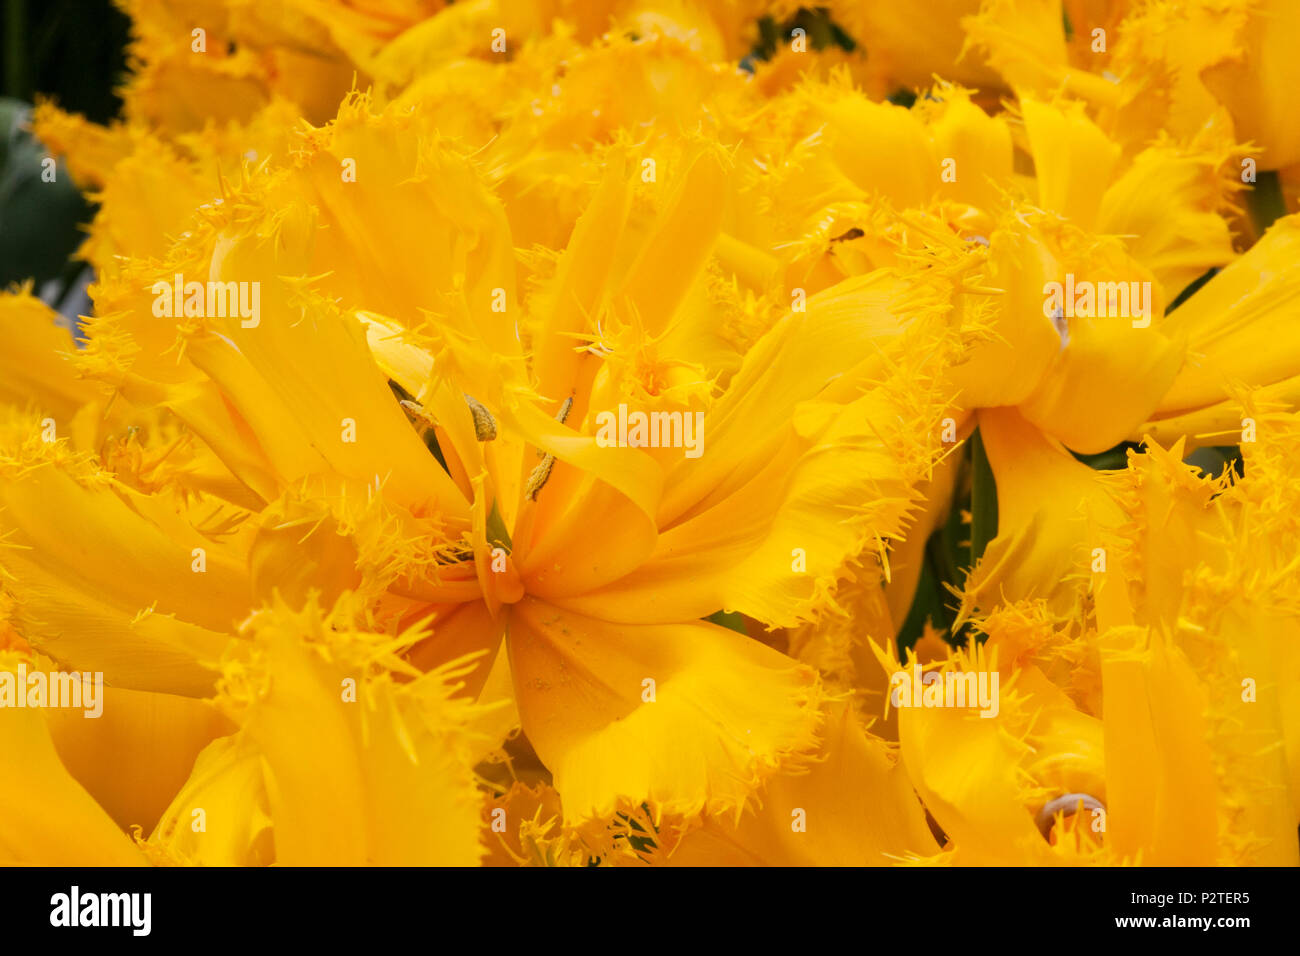 Fringed Tulip, Tulipa fringed 'MON AMOUR', at the Keukenhof Gardens in South Holland, The Netherlands. - Stock Image